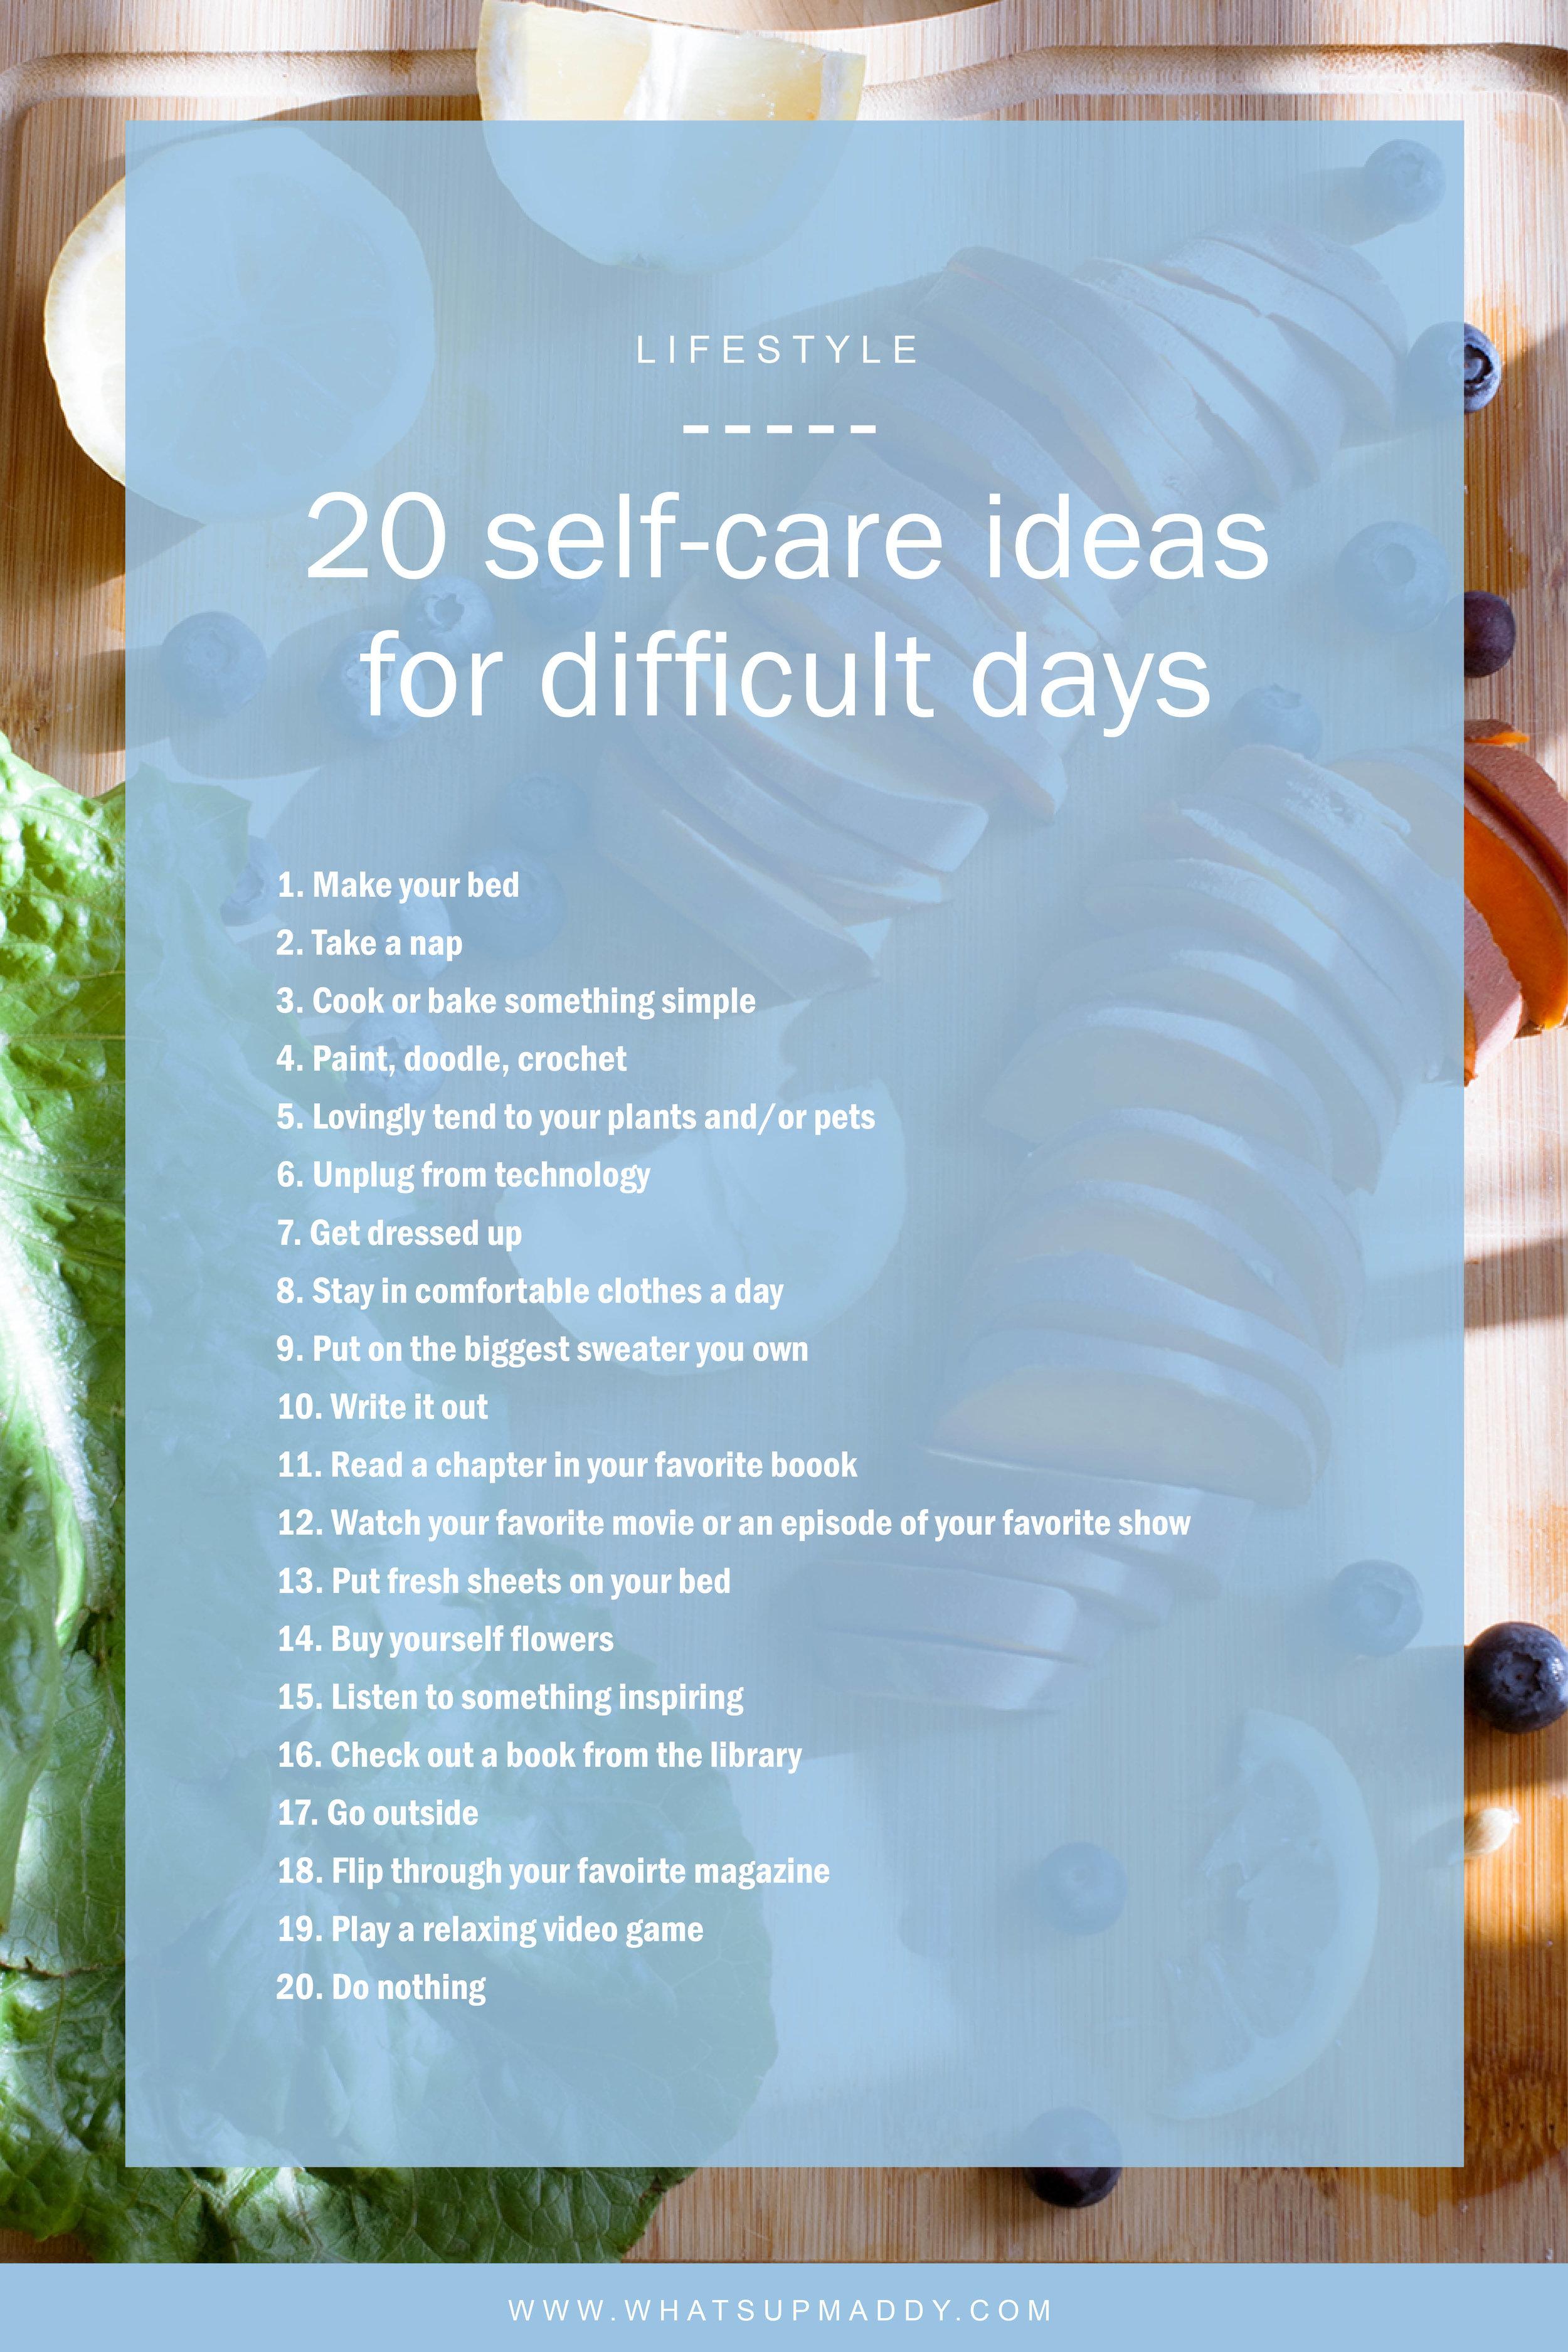 20 selfcareideas_list.jpg